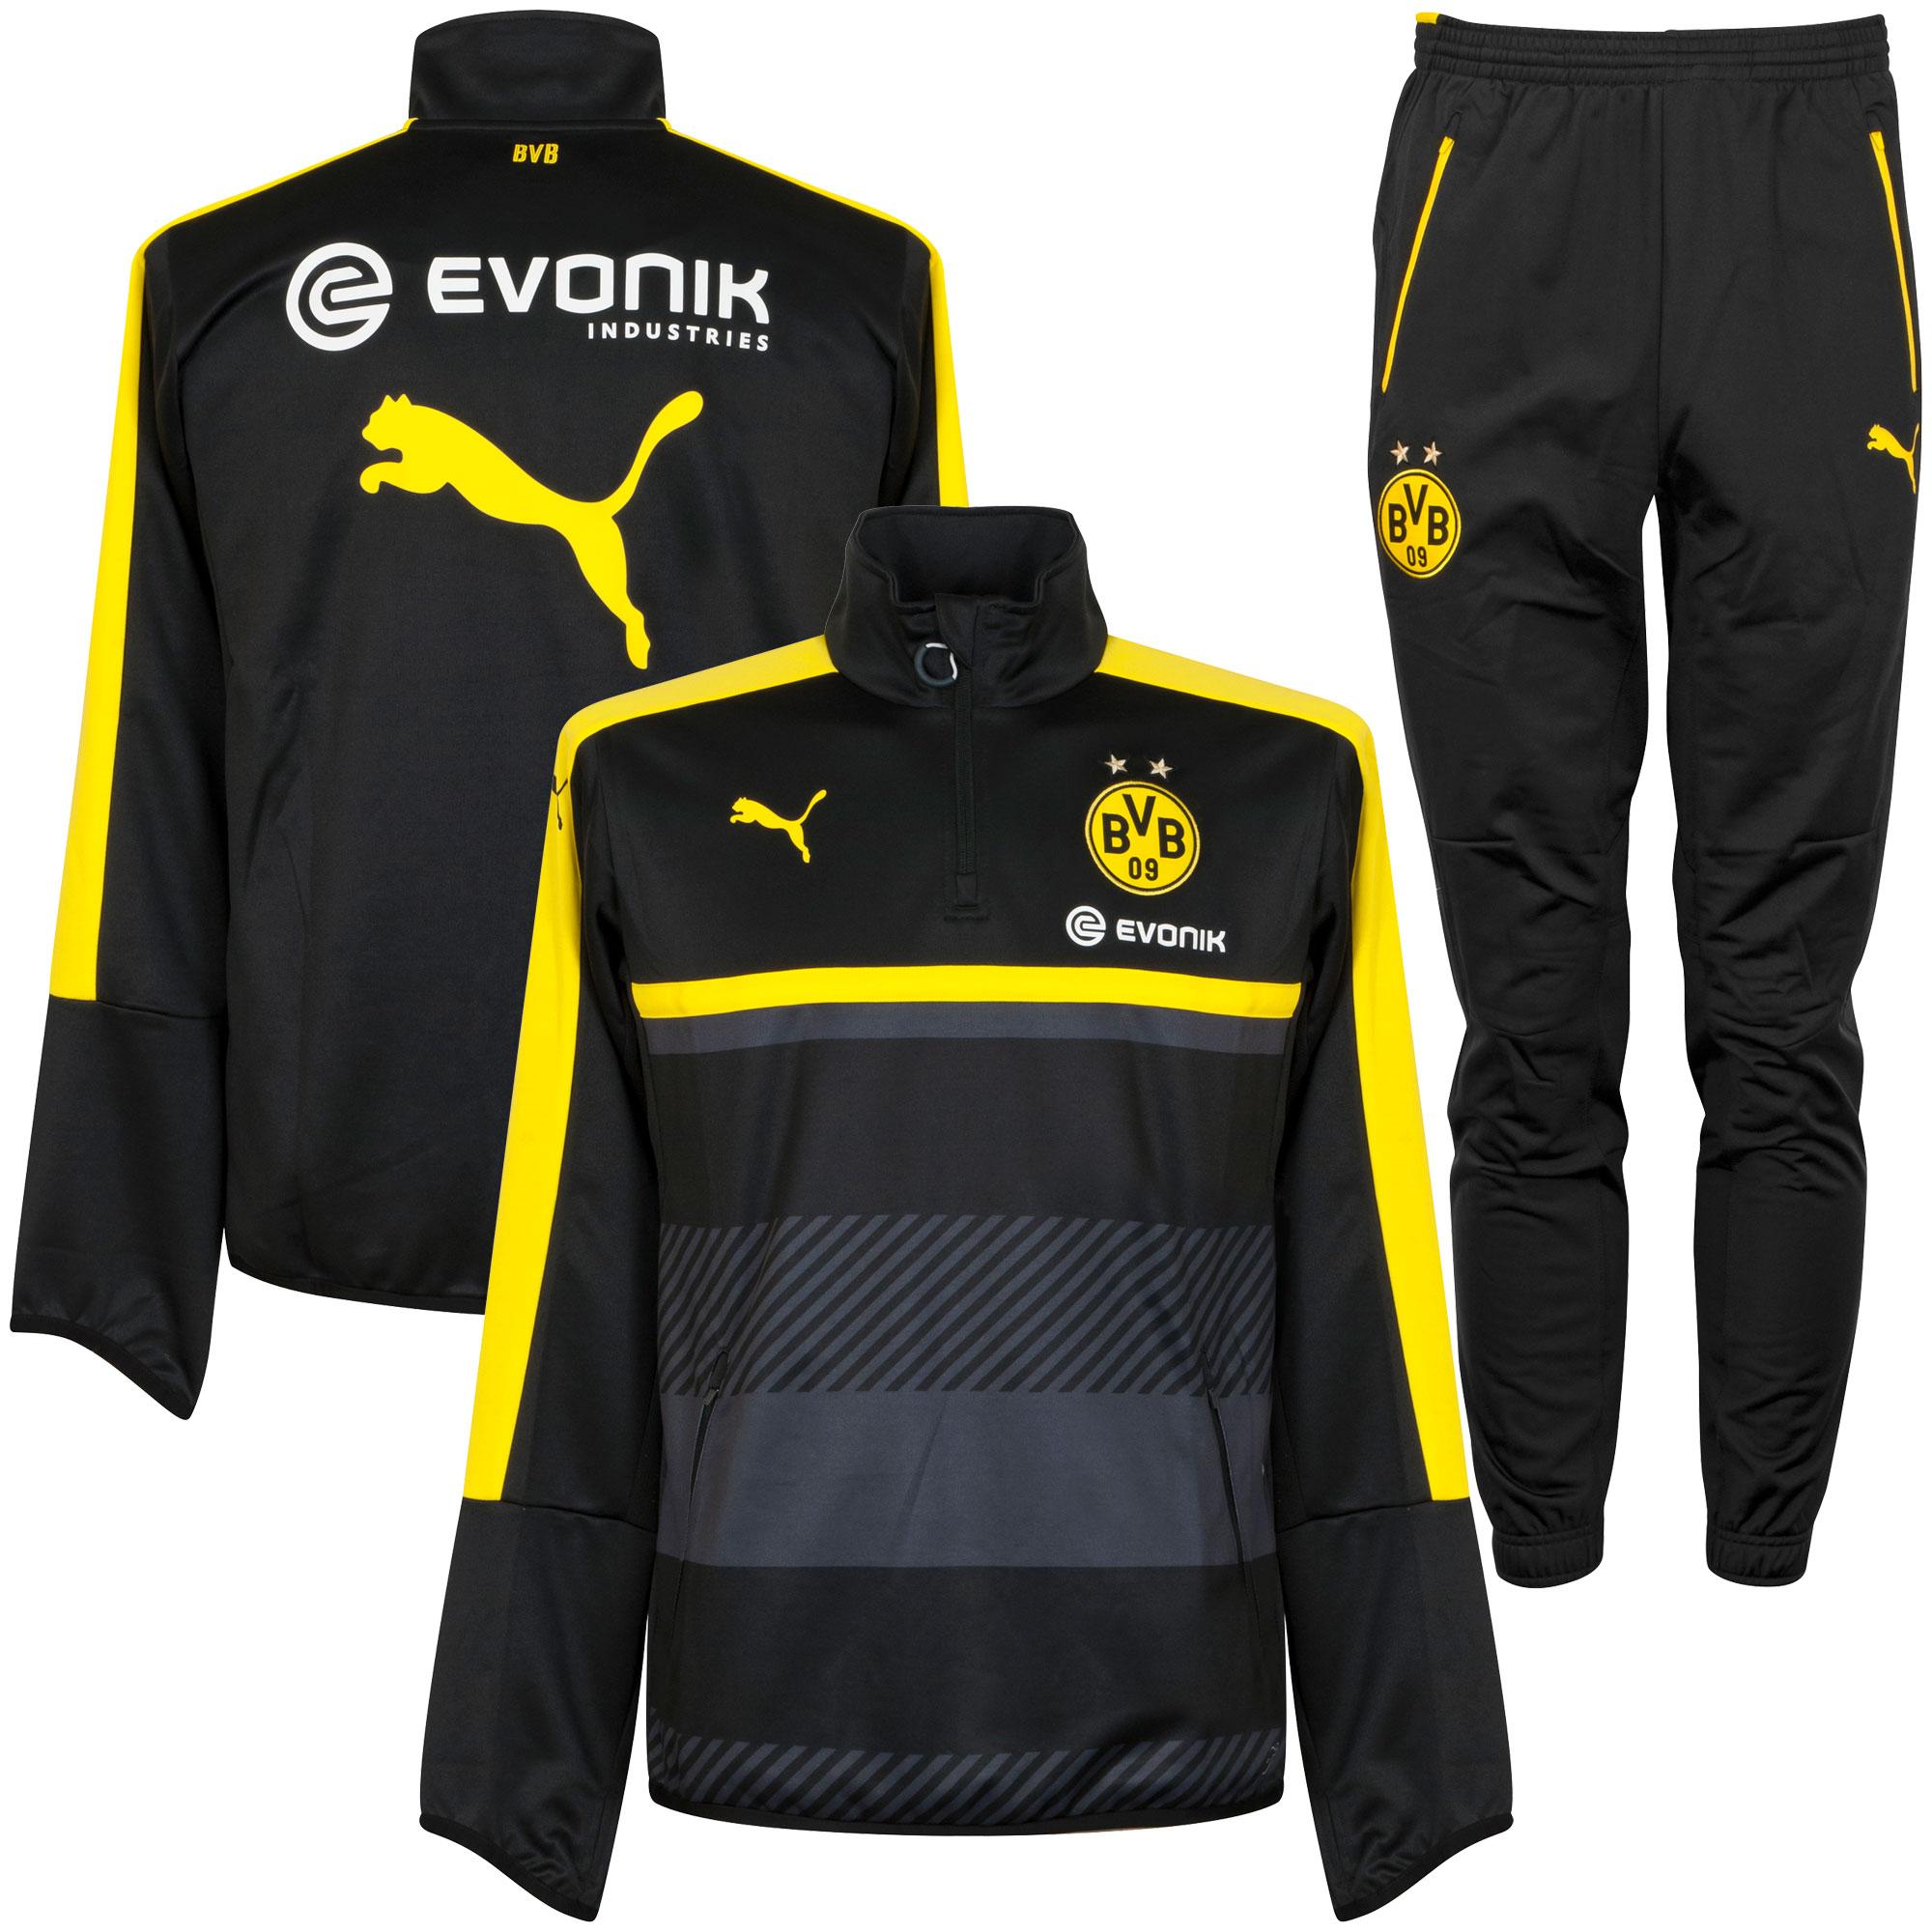 Borussia Dortmund KIDS Training Suit 2016 / 2017 - Black - 176